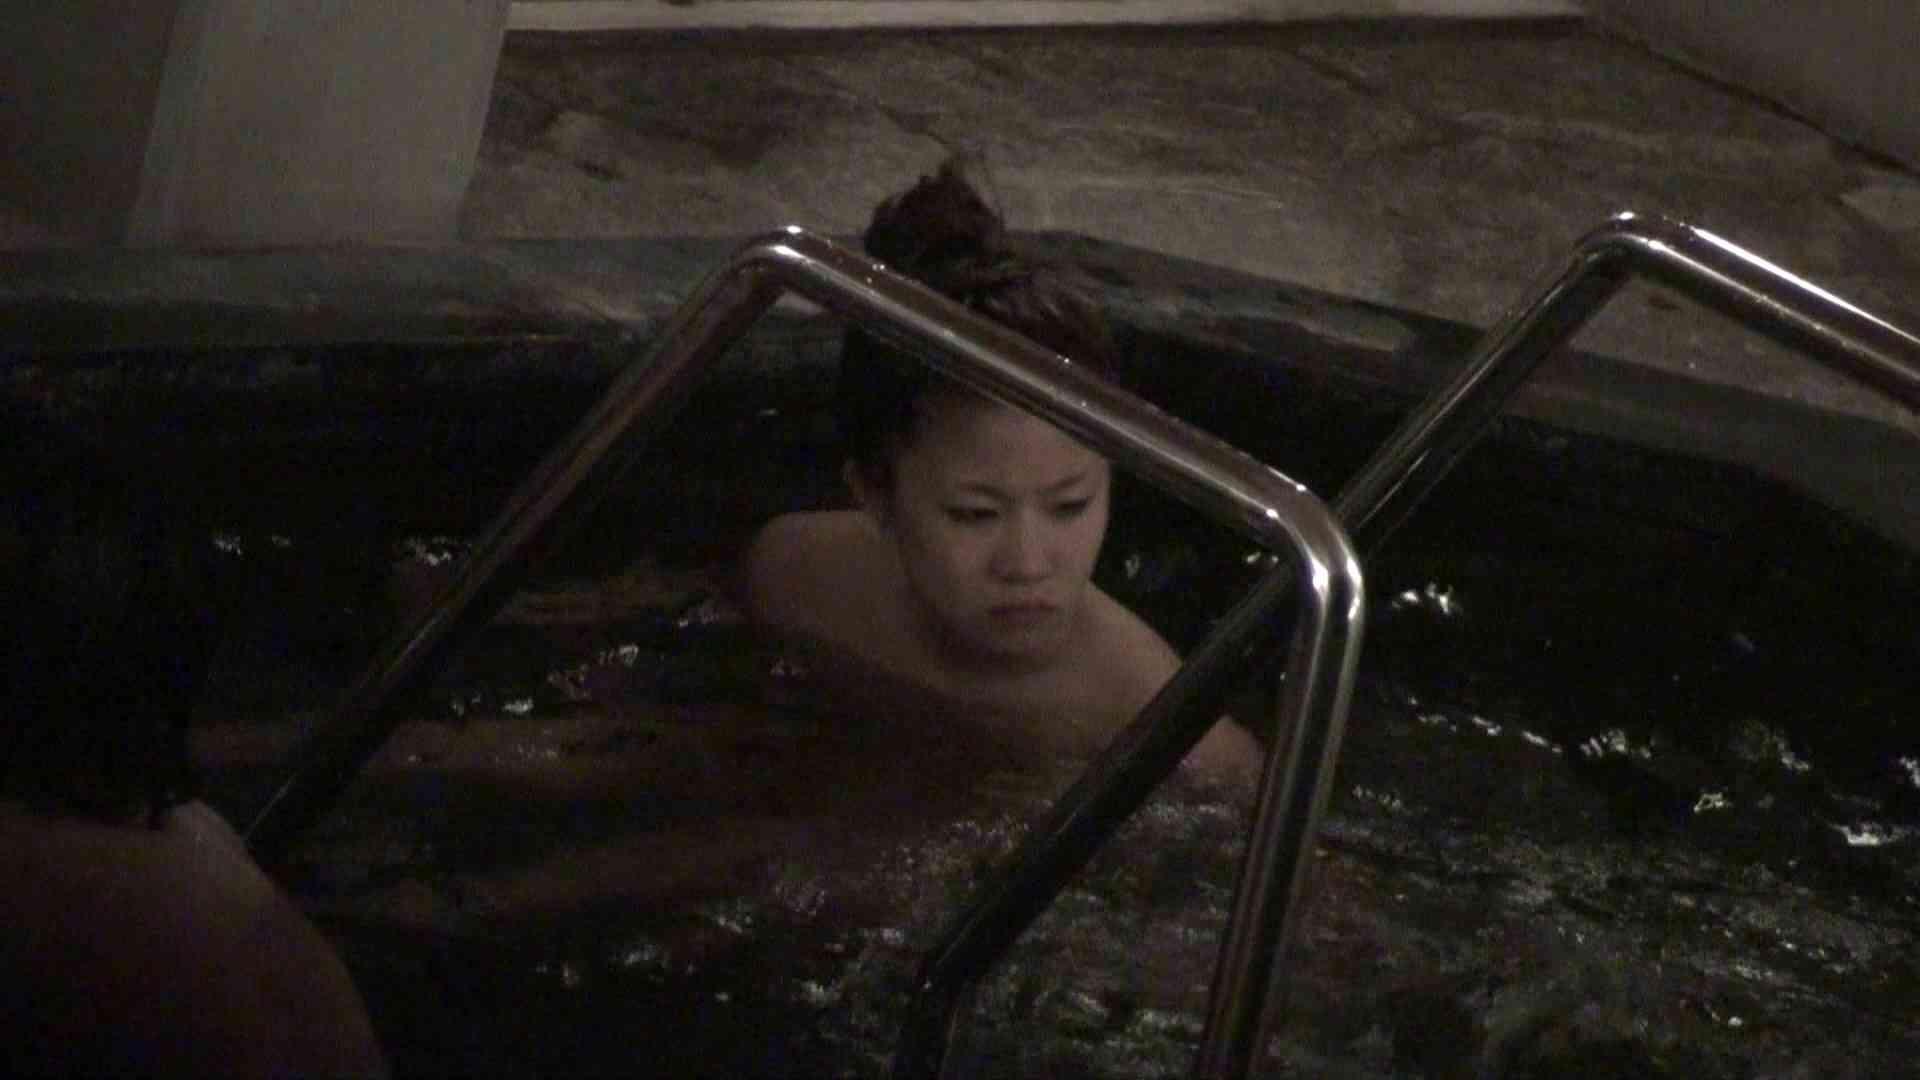 Aquaな露天風呂Vol.378 0  88連発 36